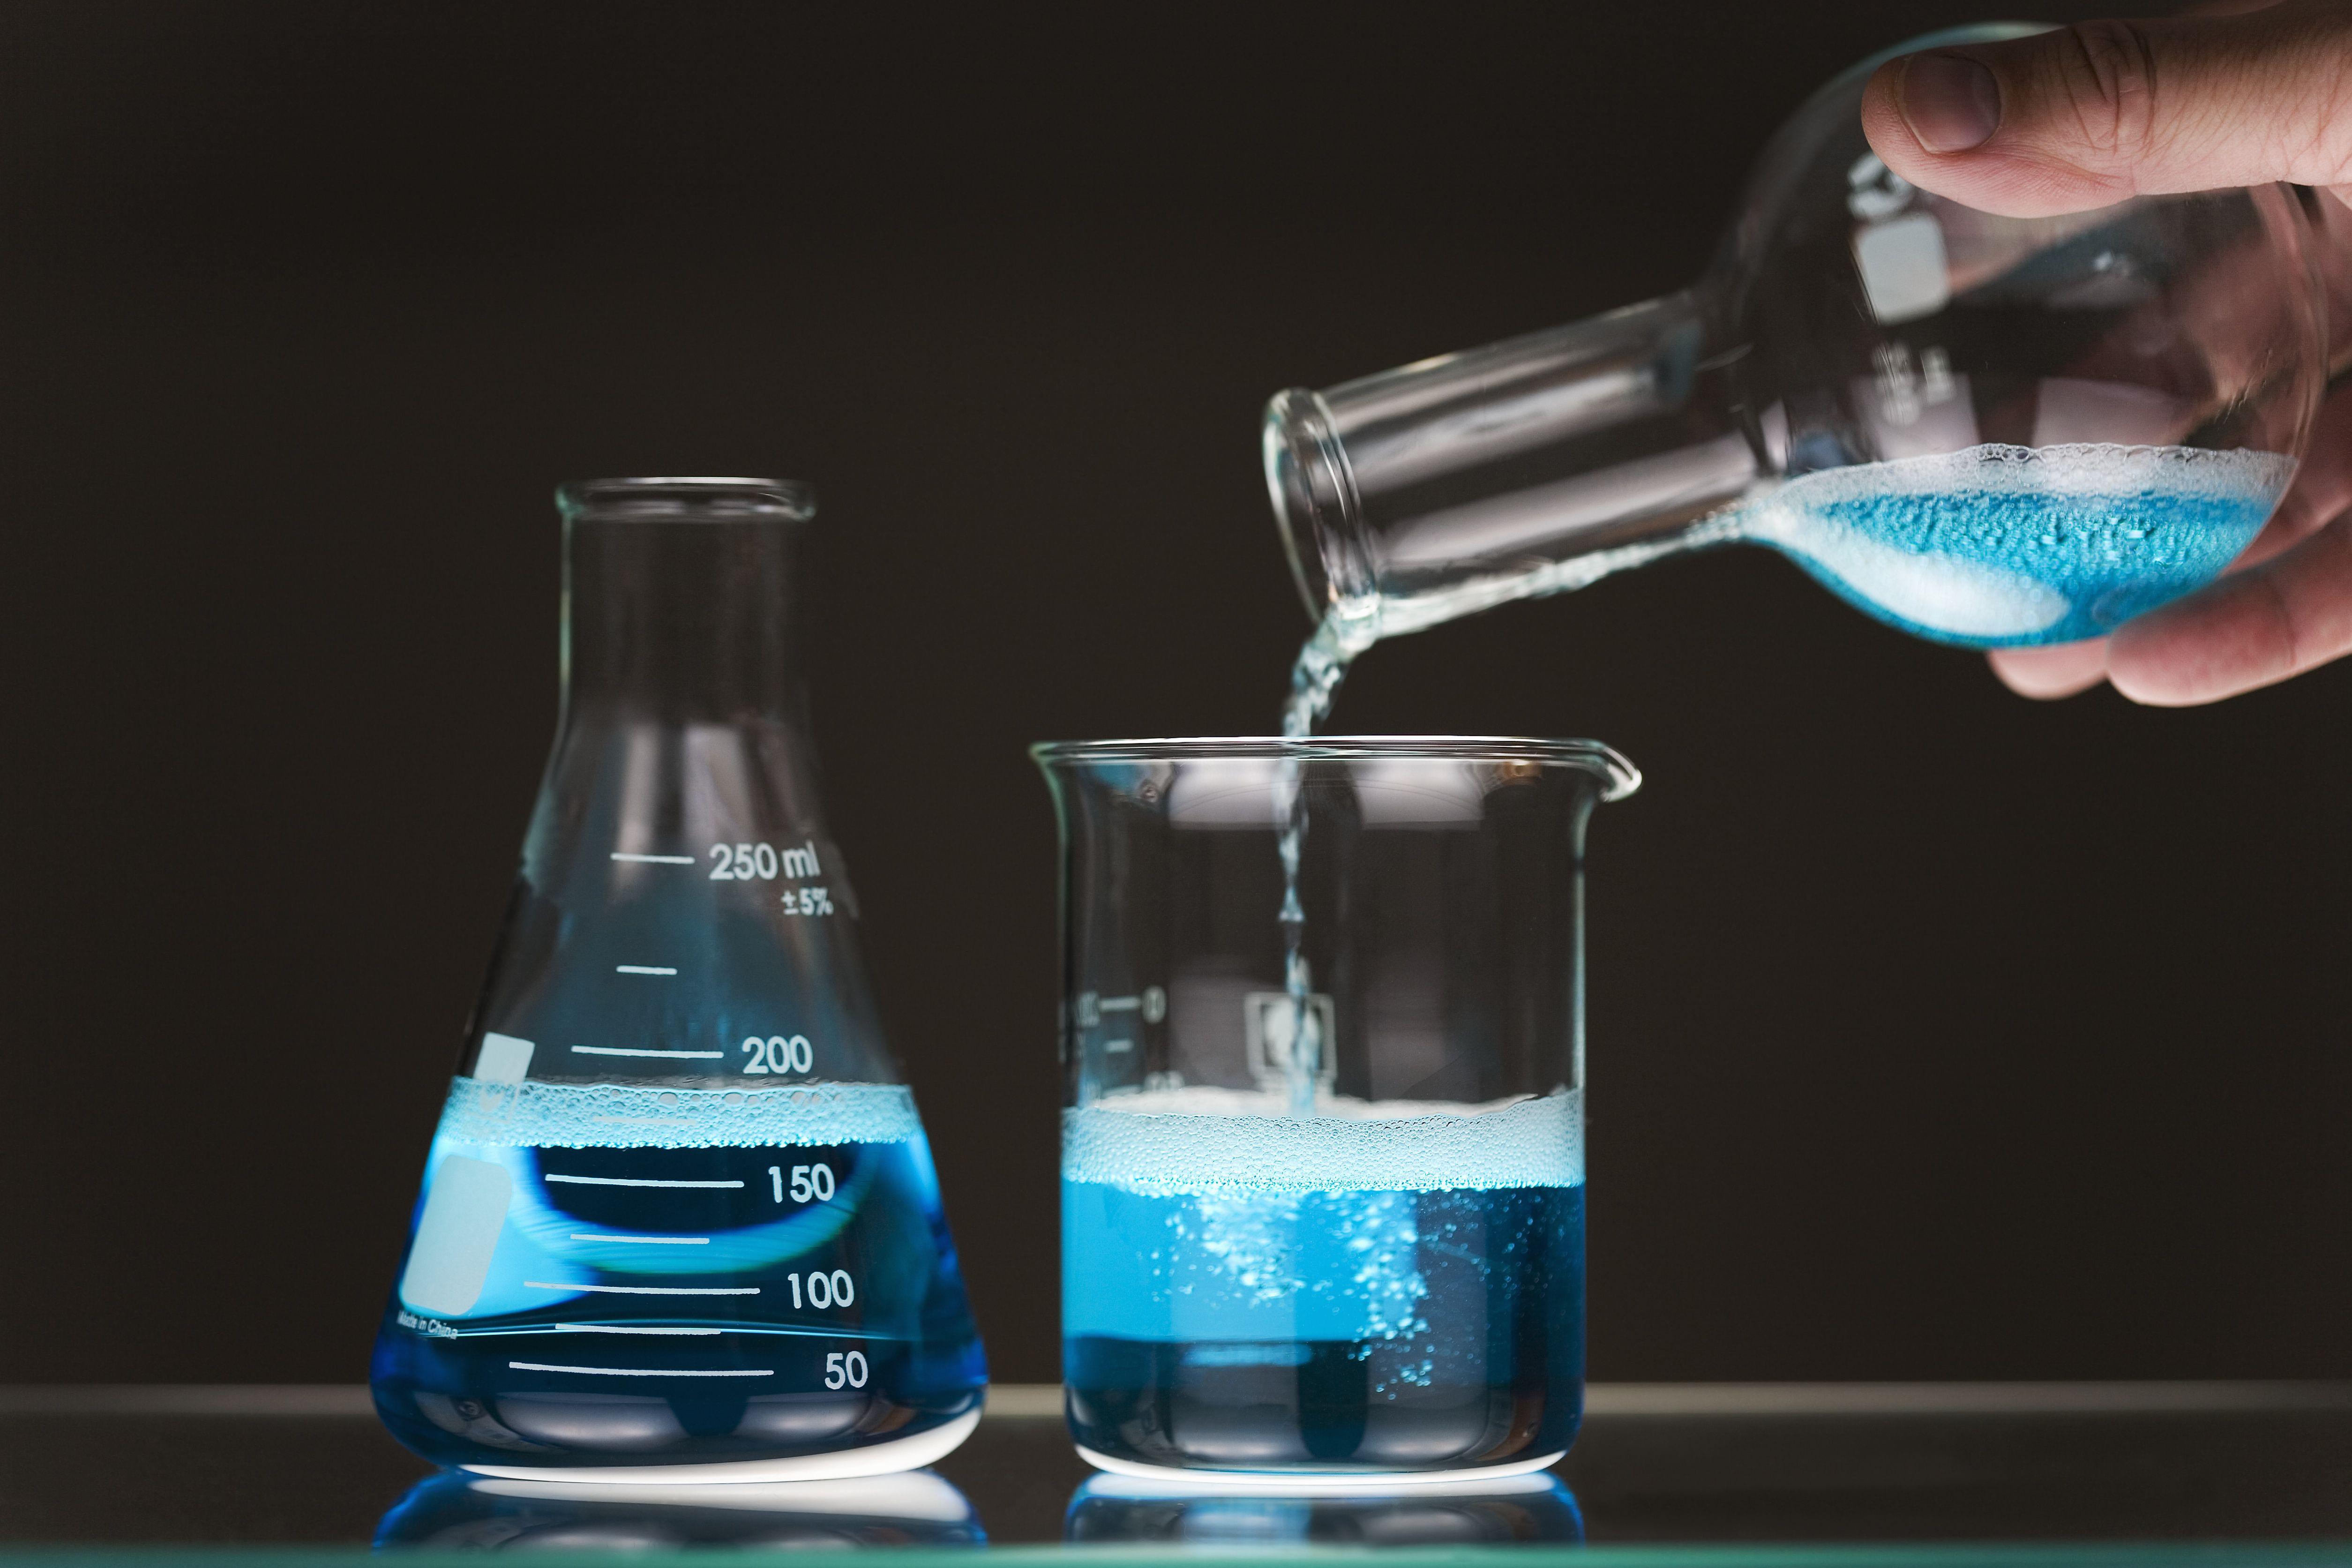 Pouring blue liquid between flasks